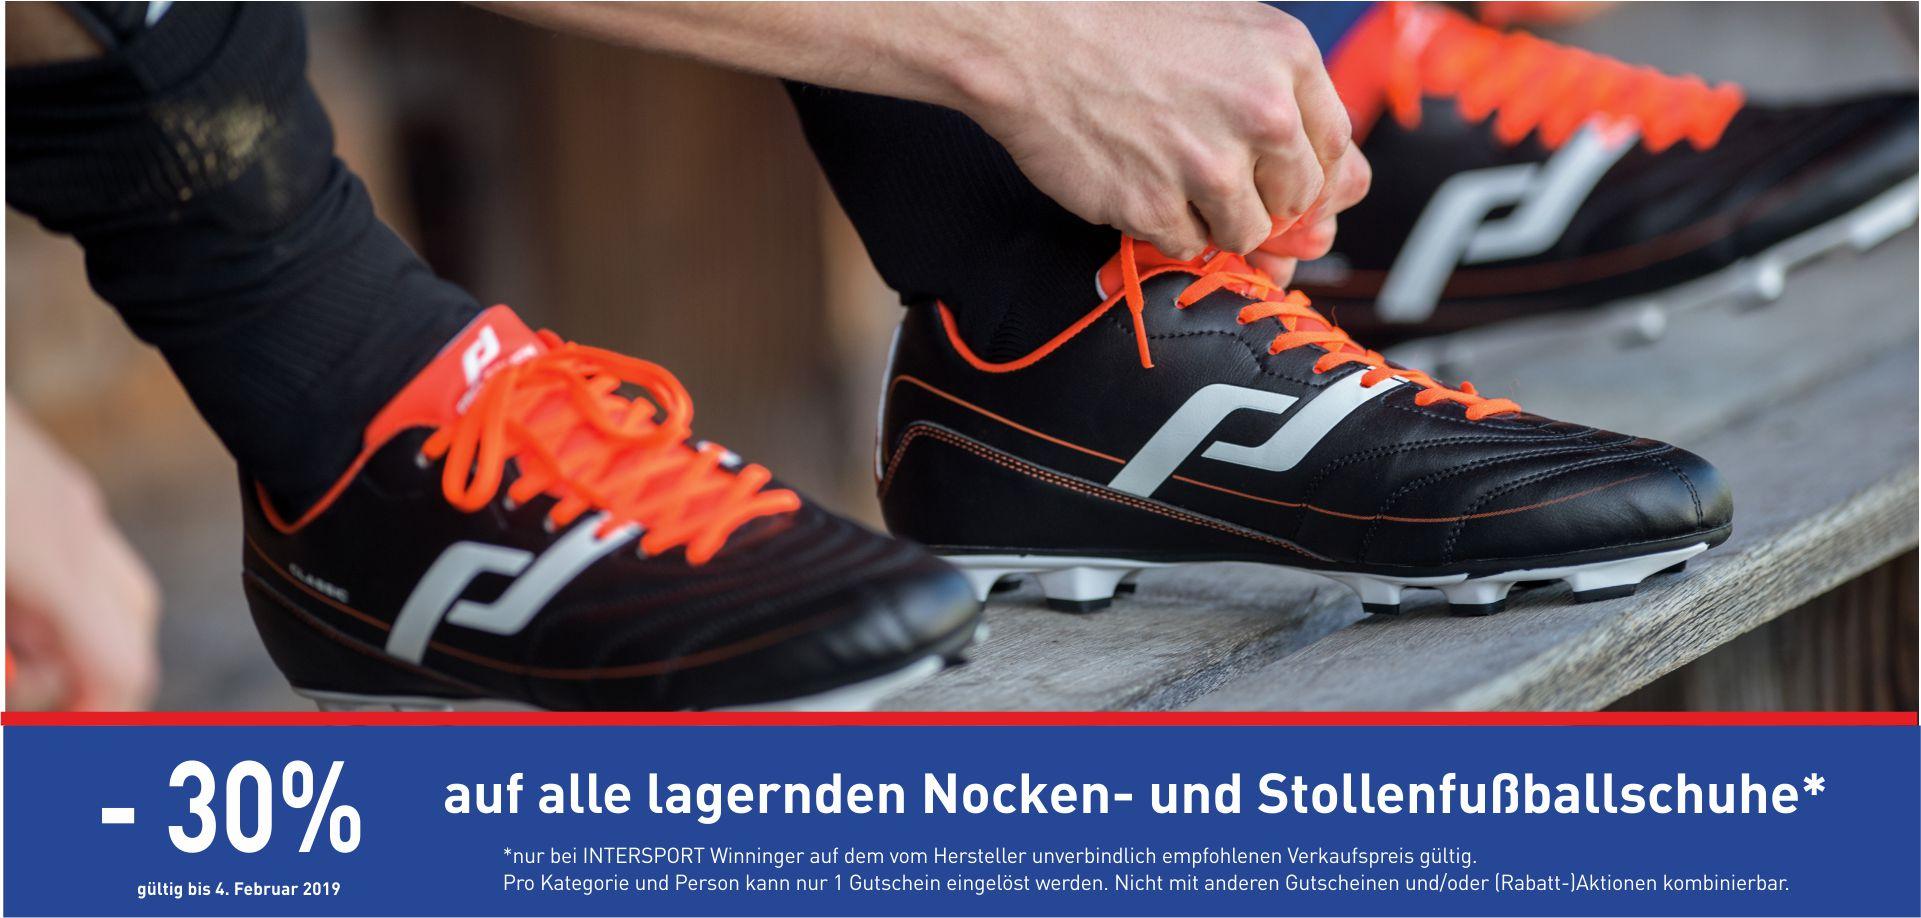 1e5b3ad74b63 Sportartikel   Sportbekleidung   Sportkompetenz - Intersport Winninger